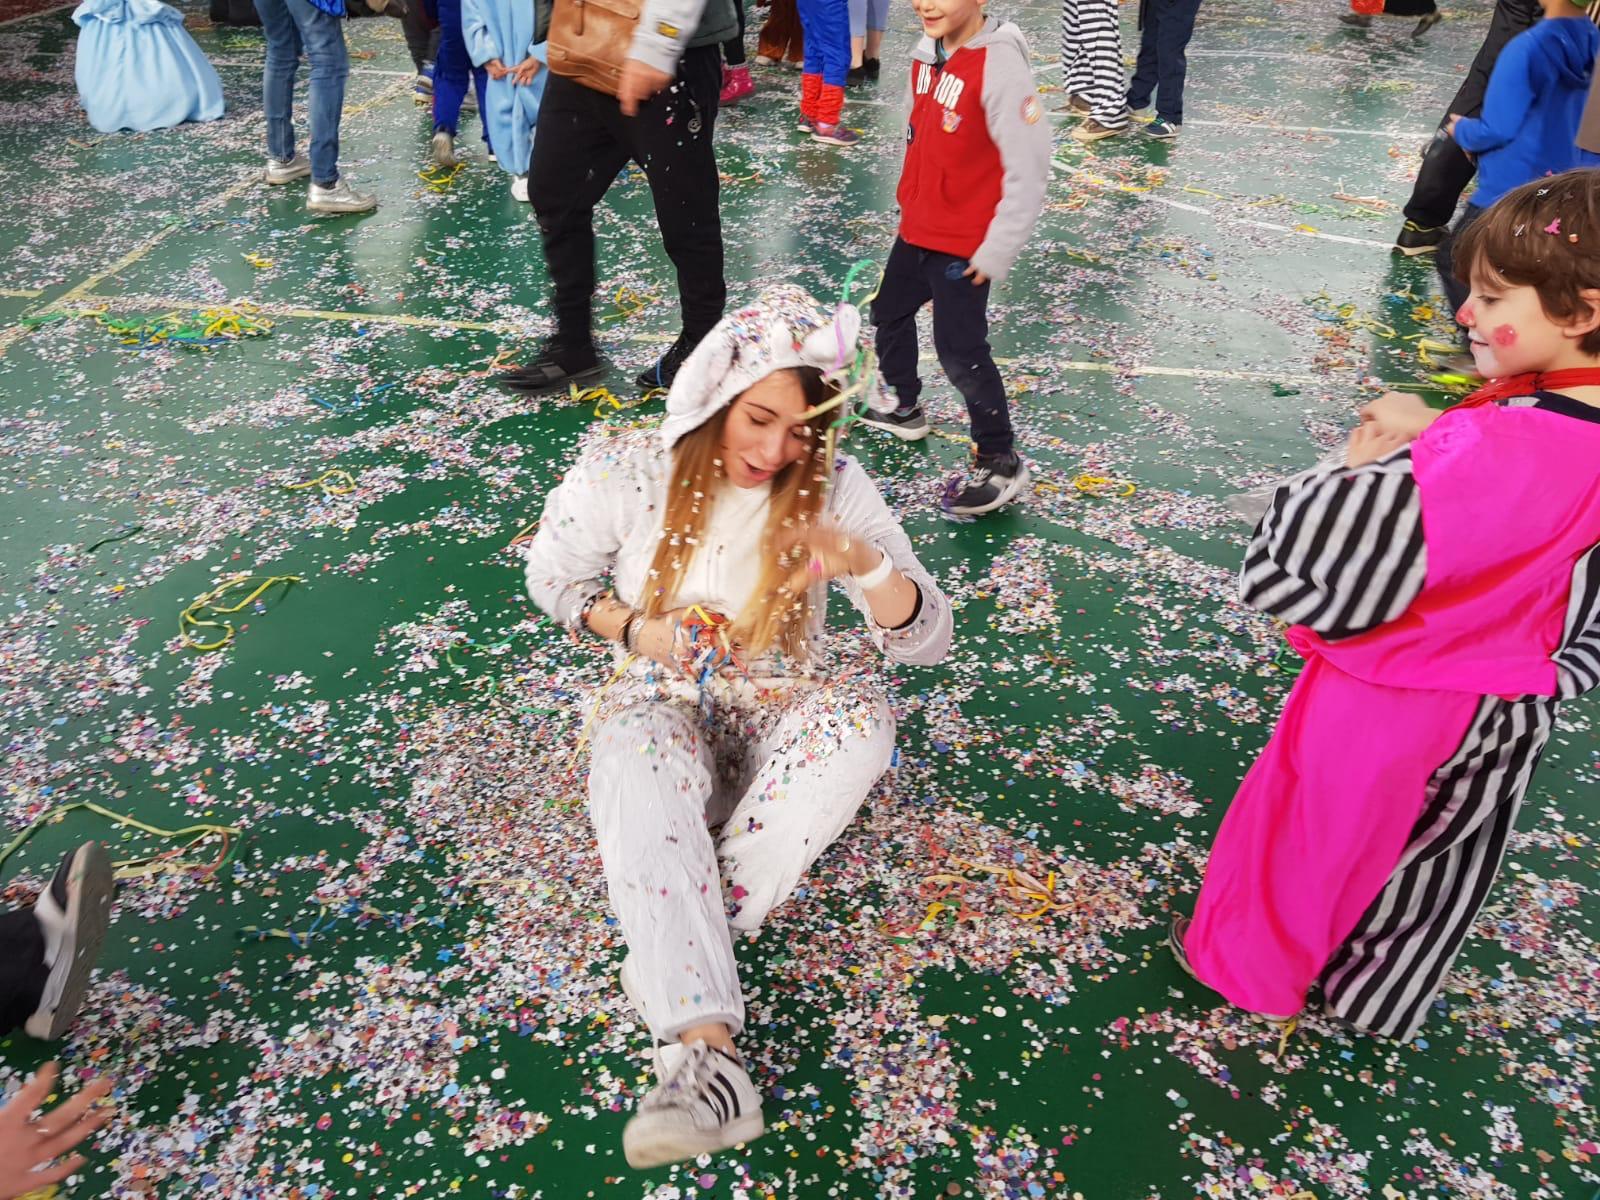 Baraonda Carnevale 2019 (10)